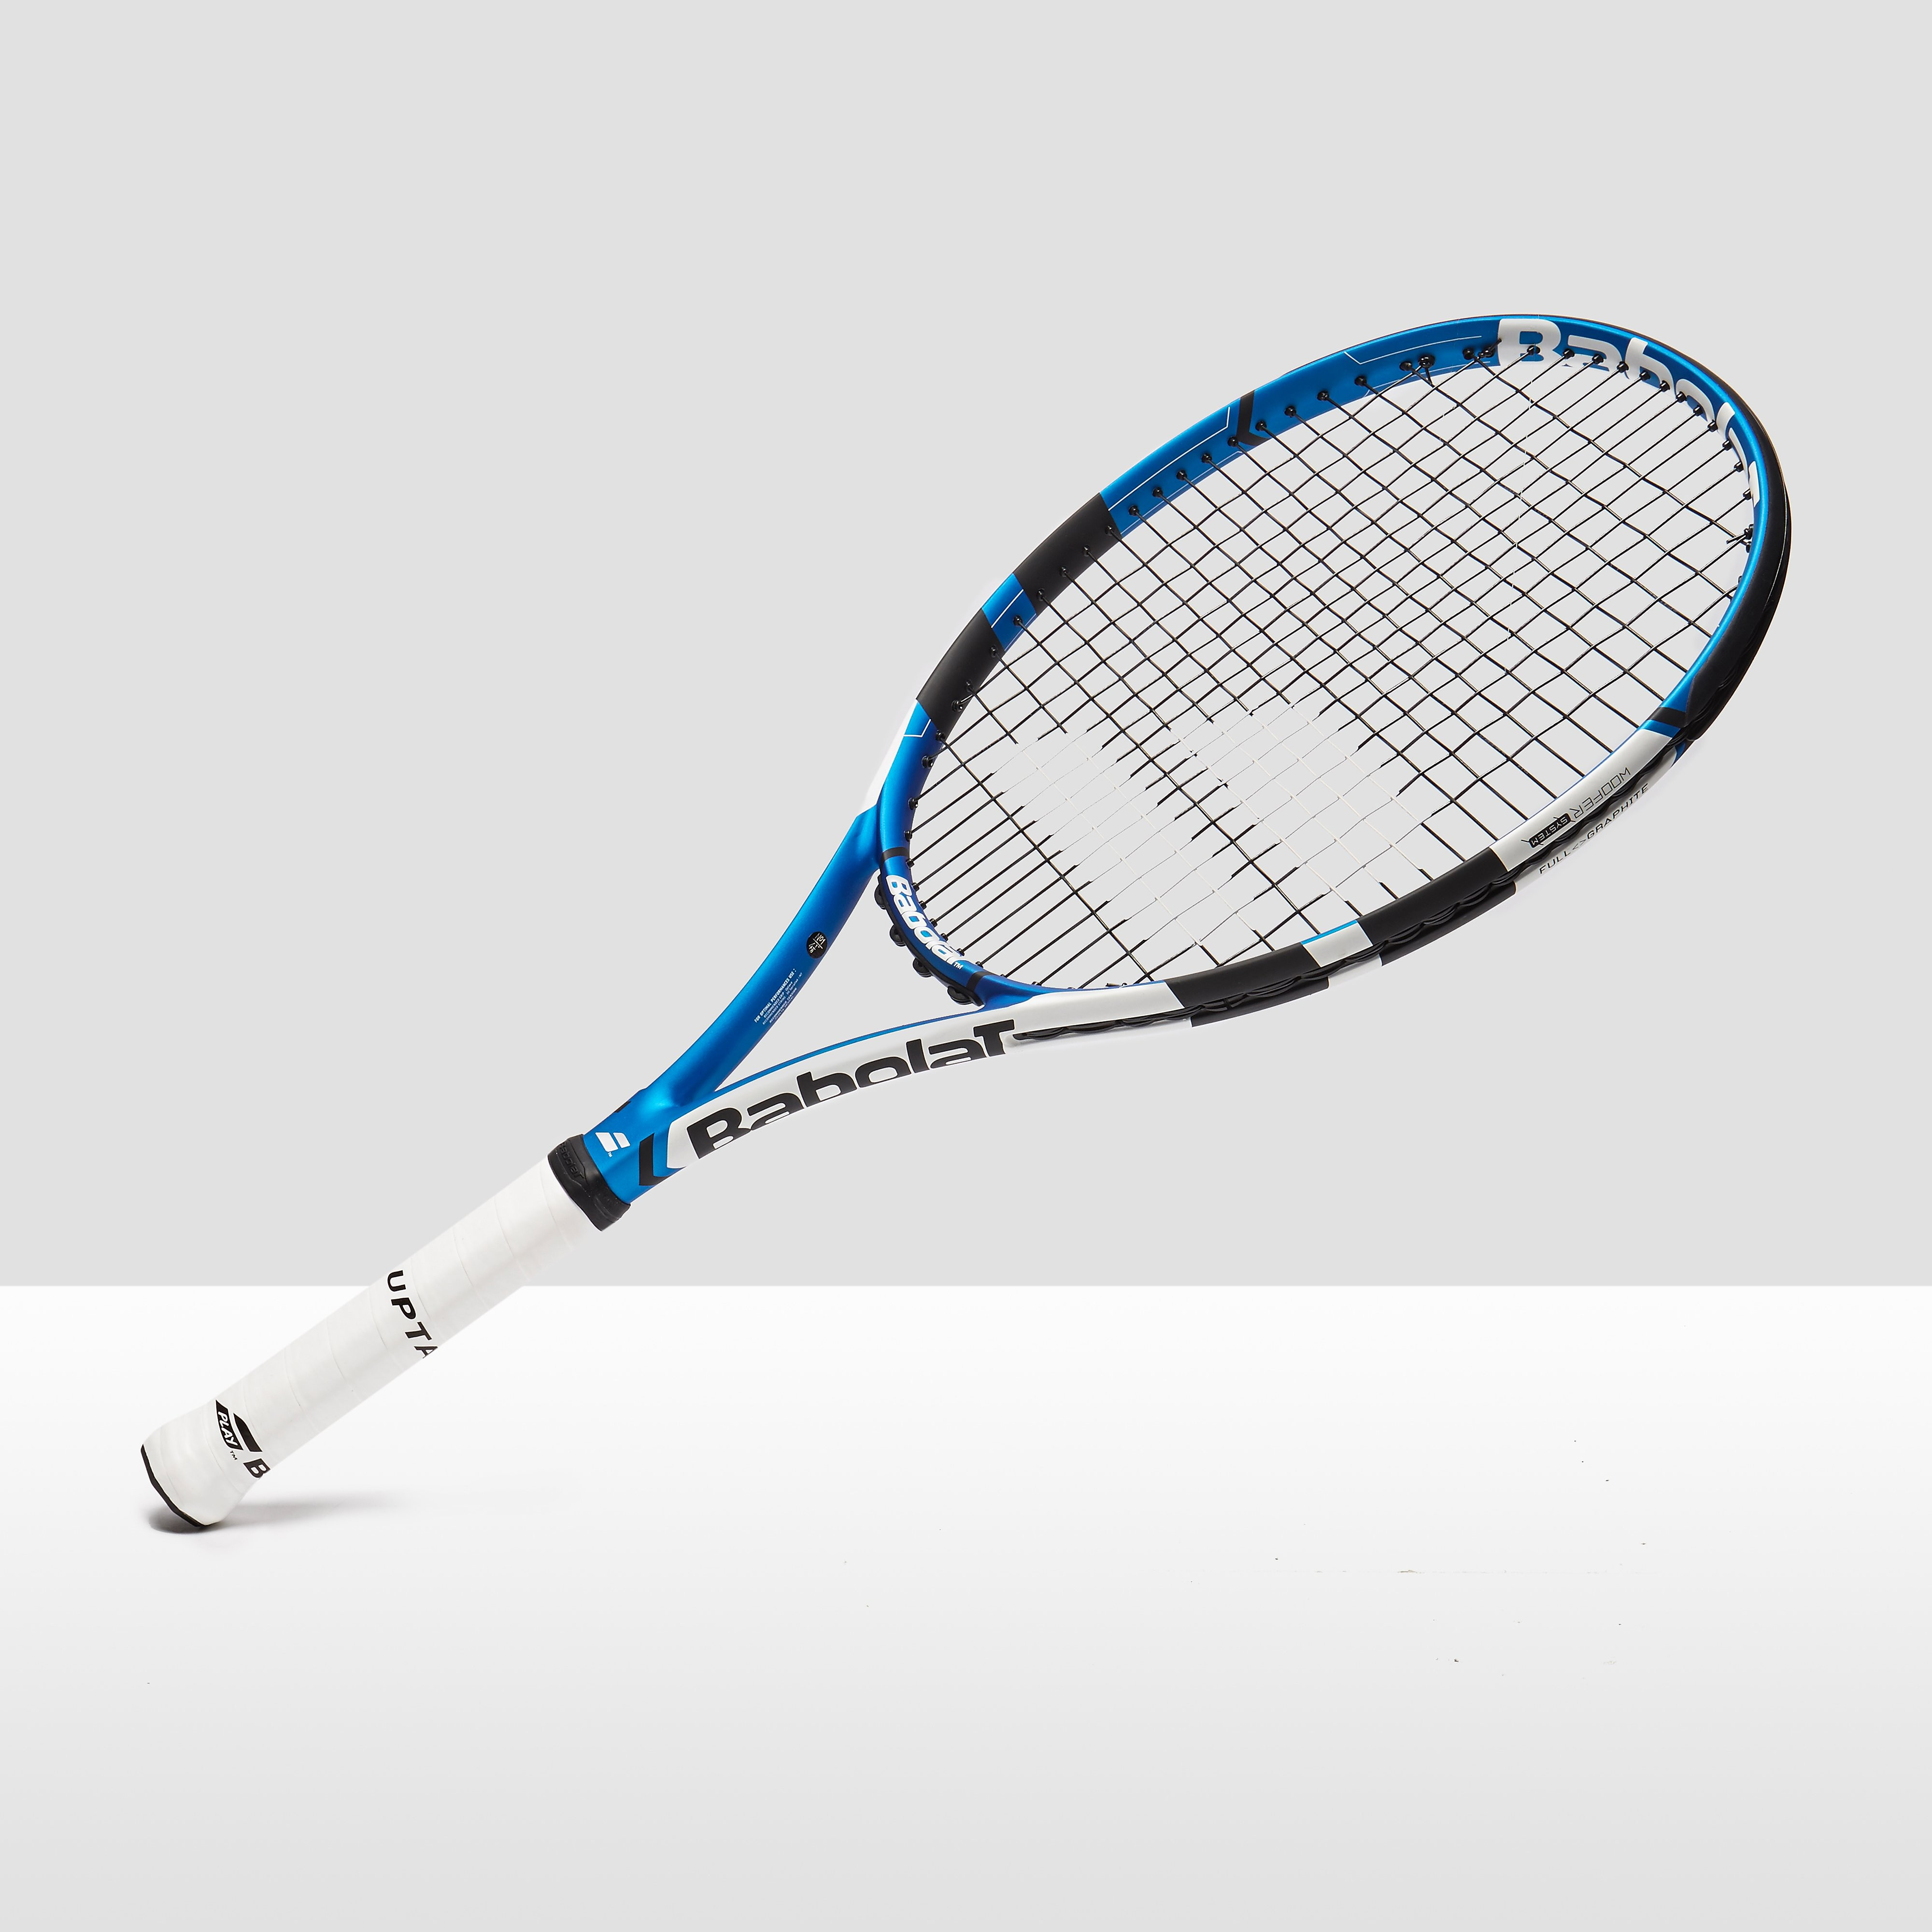 Babolat Boost Drive Tennis Racket